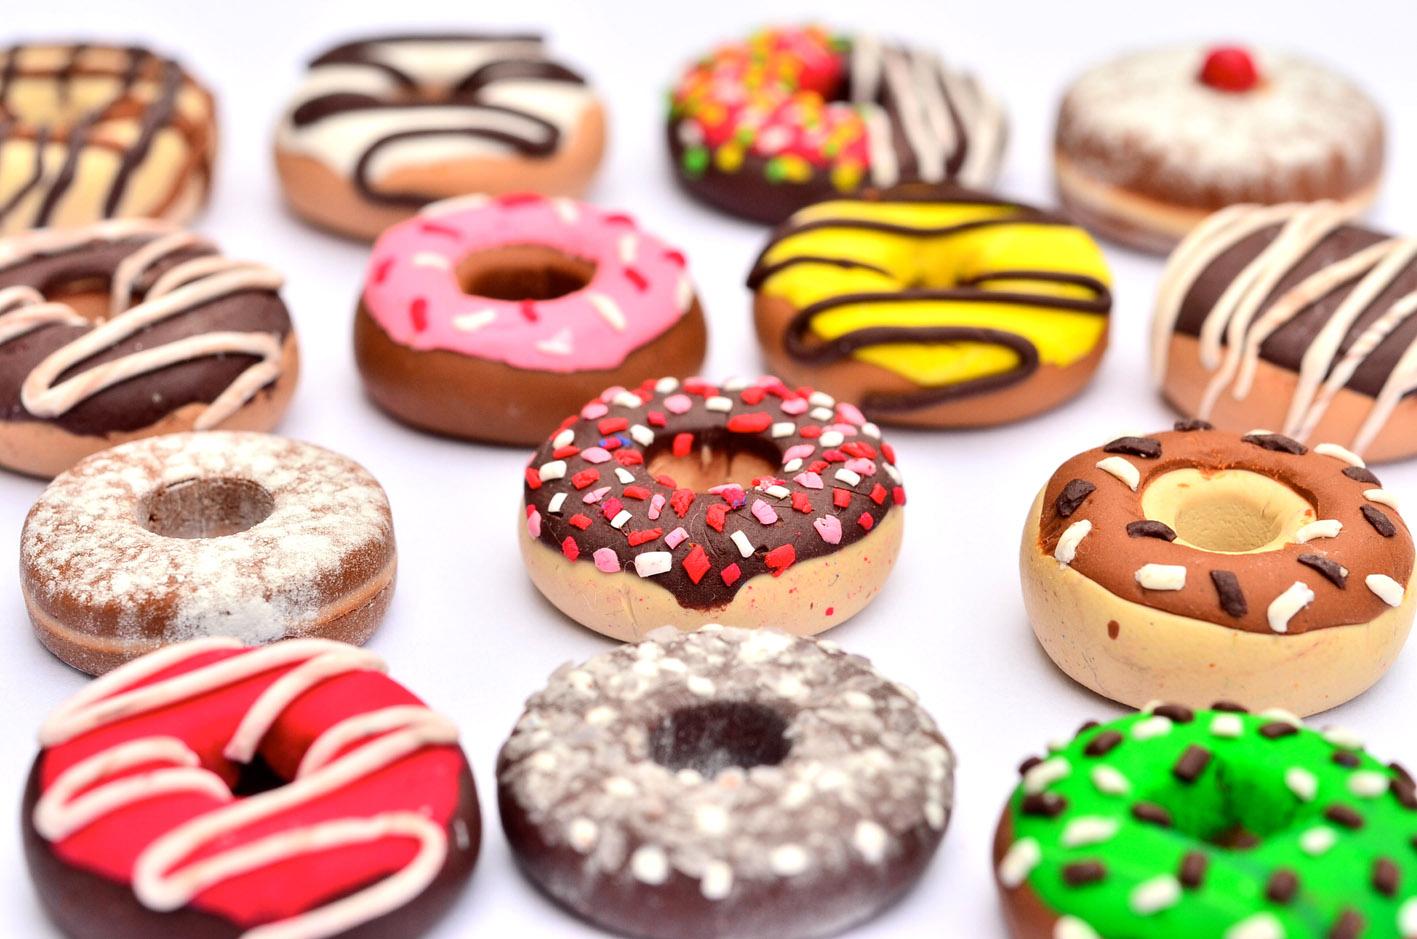 Oui Oui-que llevar de cumpleaños a la oficina-dunkin donuts